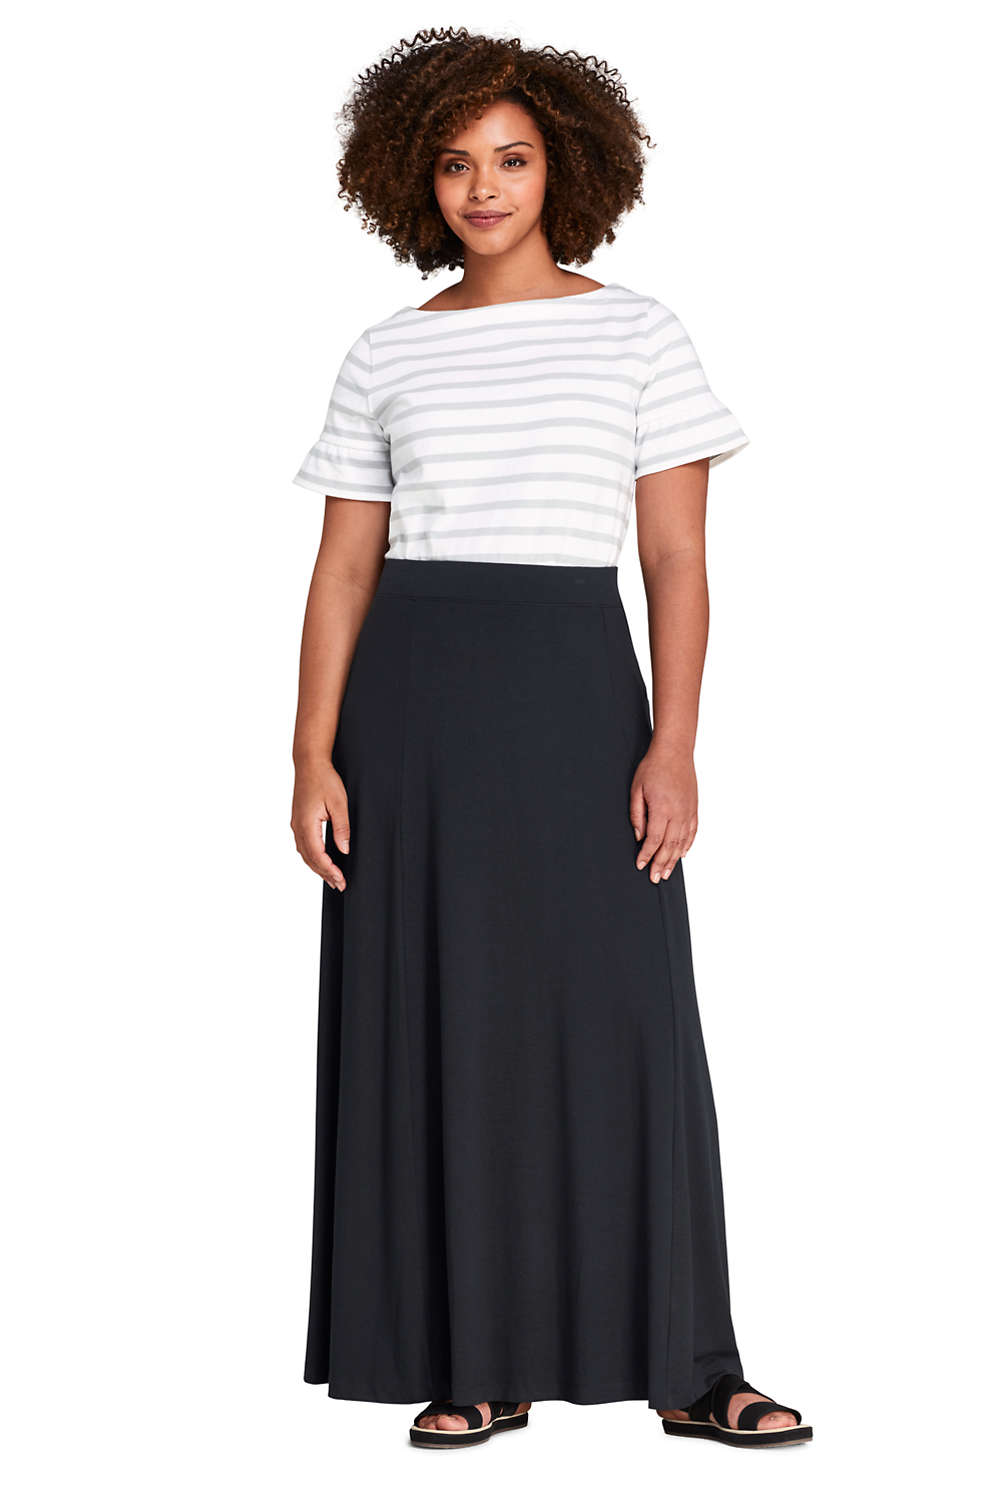 e475379d6 Women's Plus Size Maxi Skirt from Lands' End